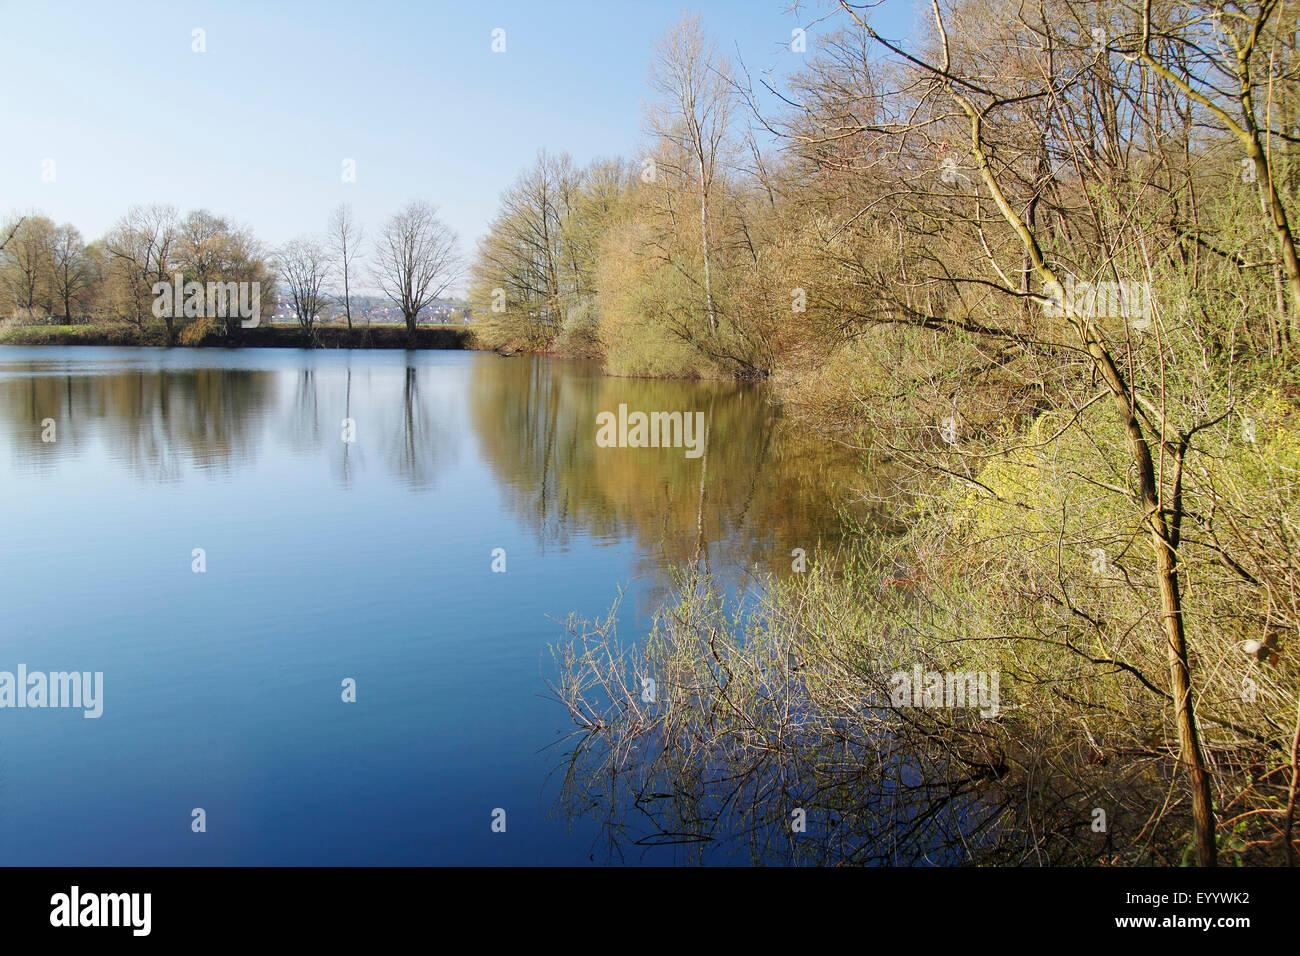 Scrubby lakeside en primavera, Alemania Baden-Wurtemberg, Offenburg Imagen De Stock